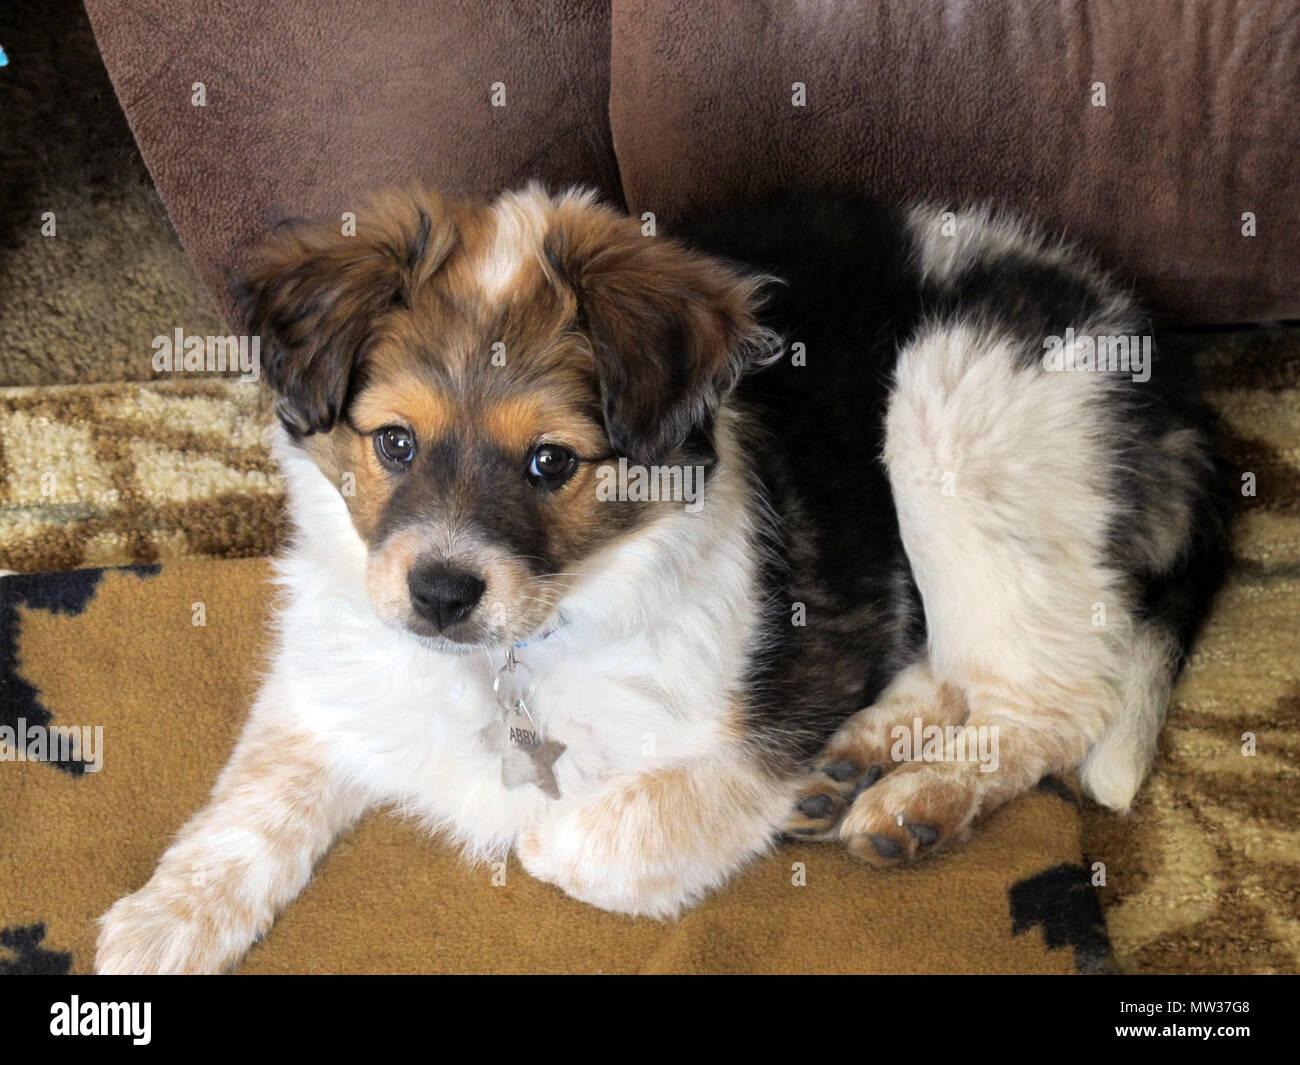 Ojos Brillantes Mini tricolor Aussie cachorro retrato sobre una alfombra Imagen De Stock